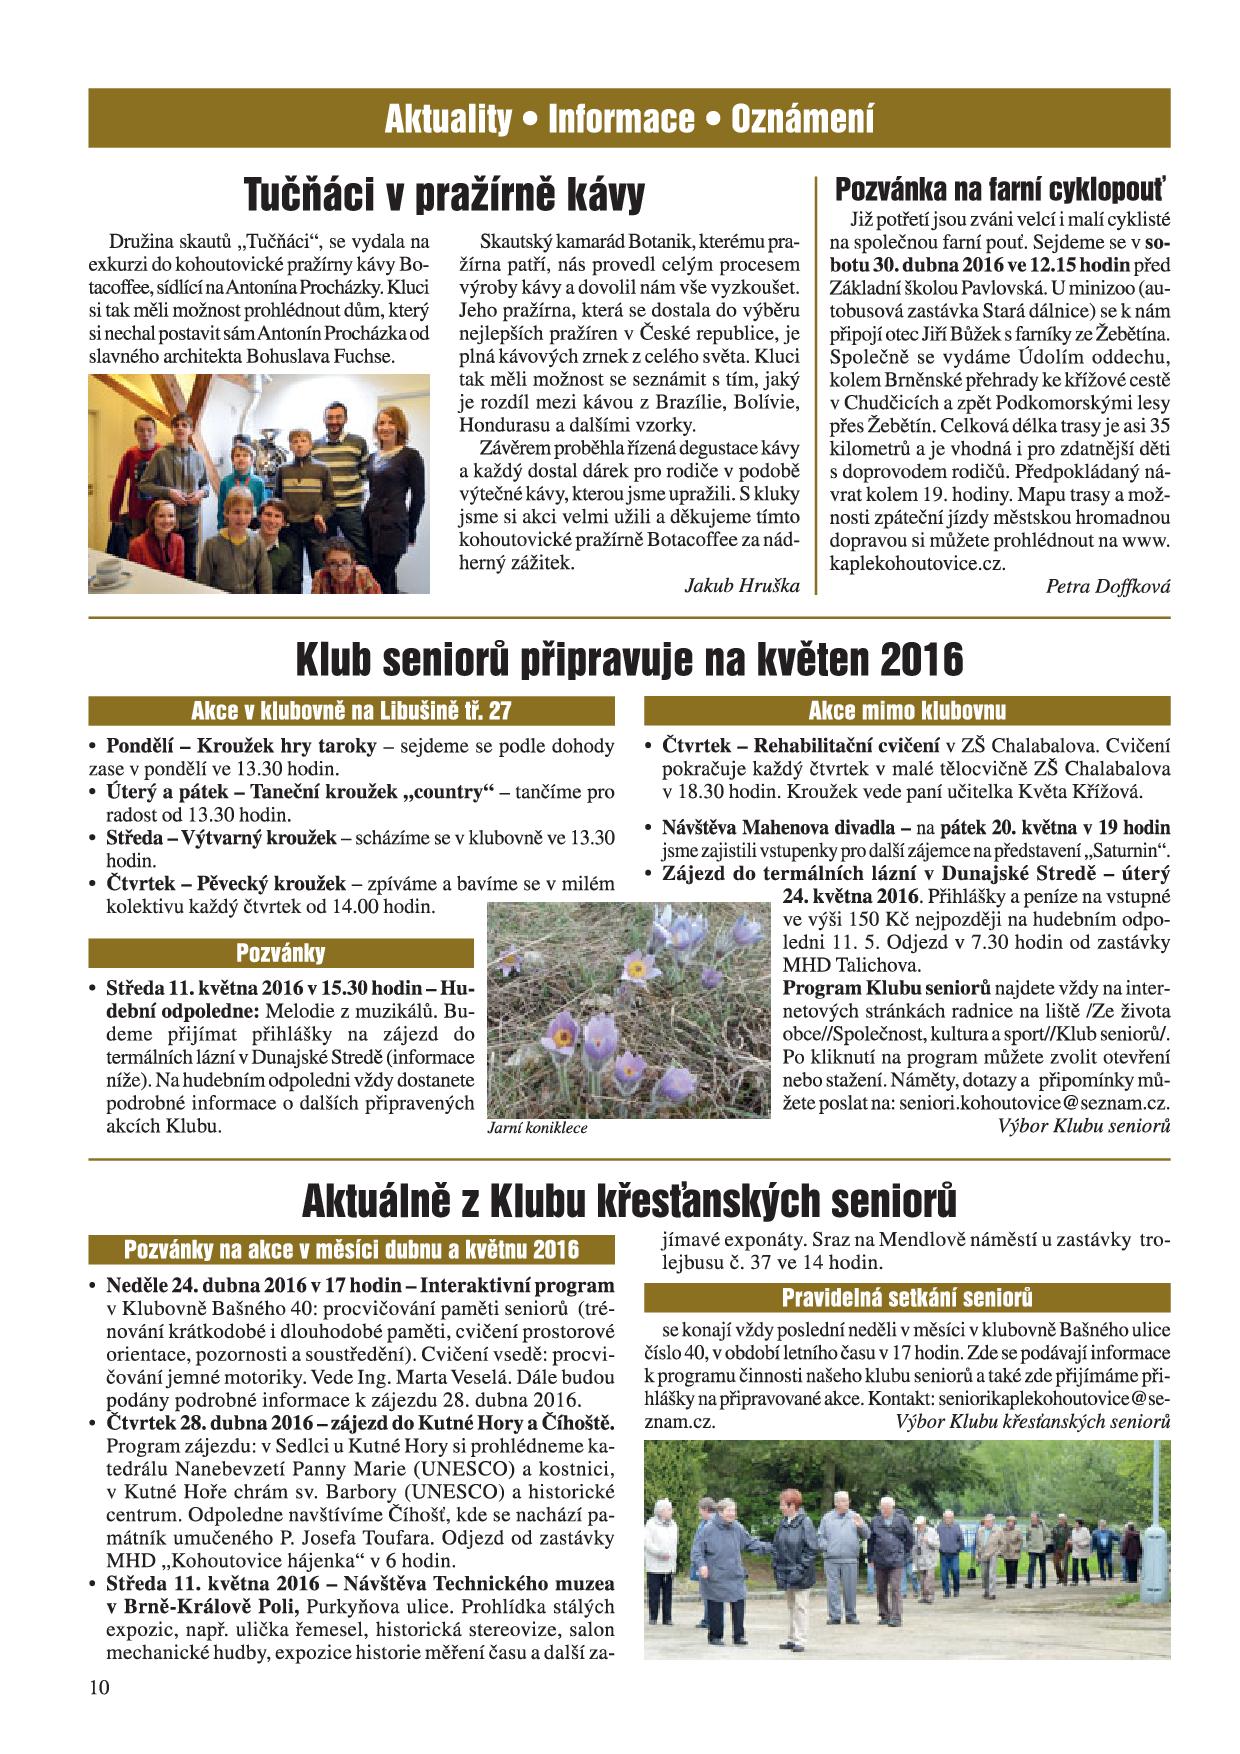 Kohoutovický-kurýr-duben-2016-10